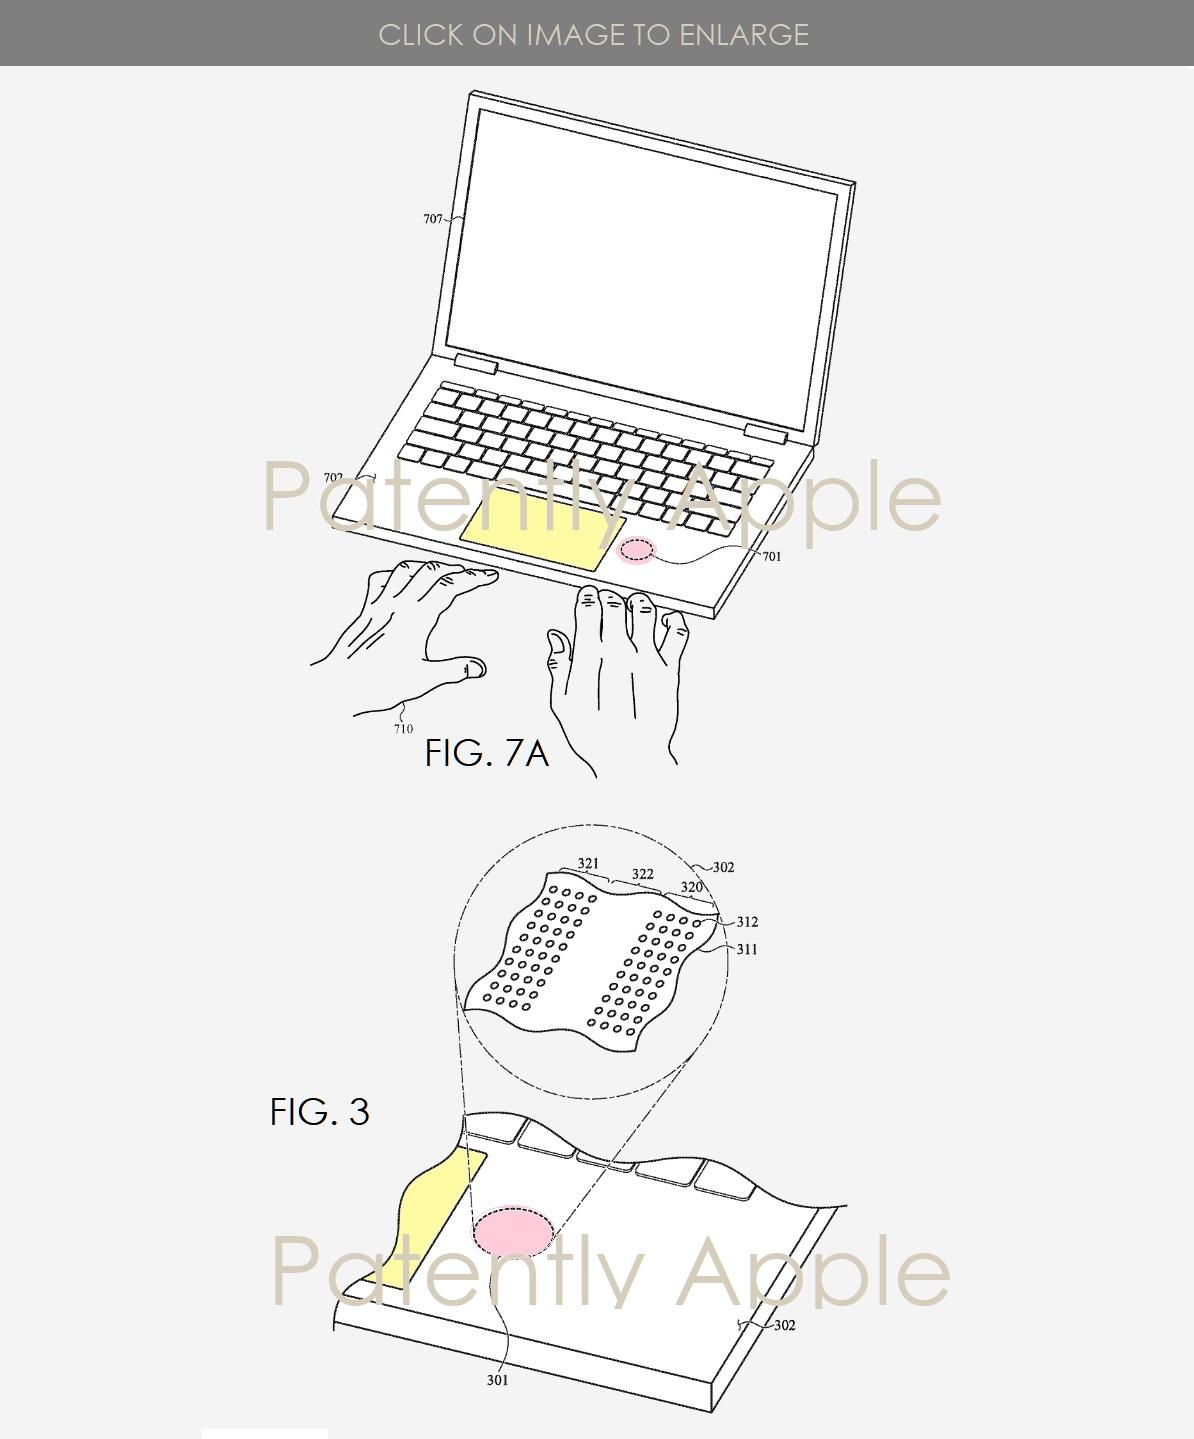 Brevetto Apple sensoe MacBook